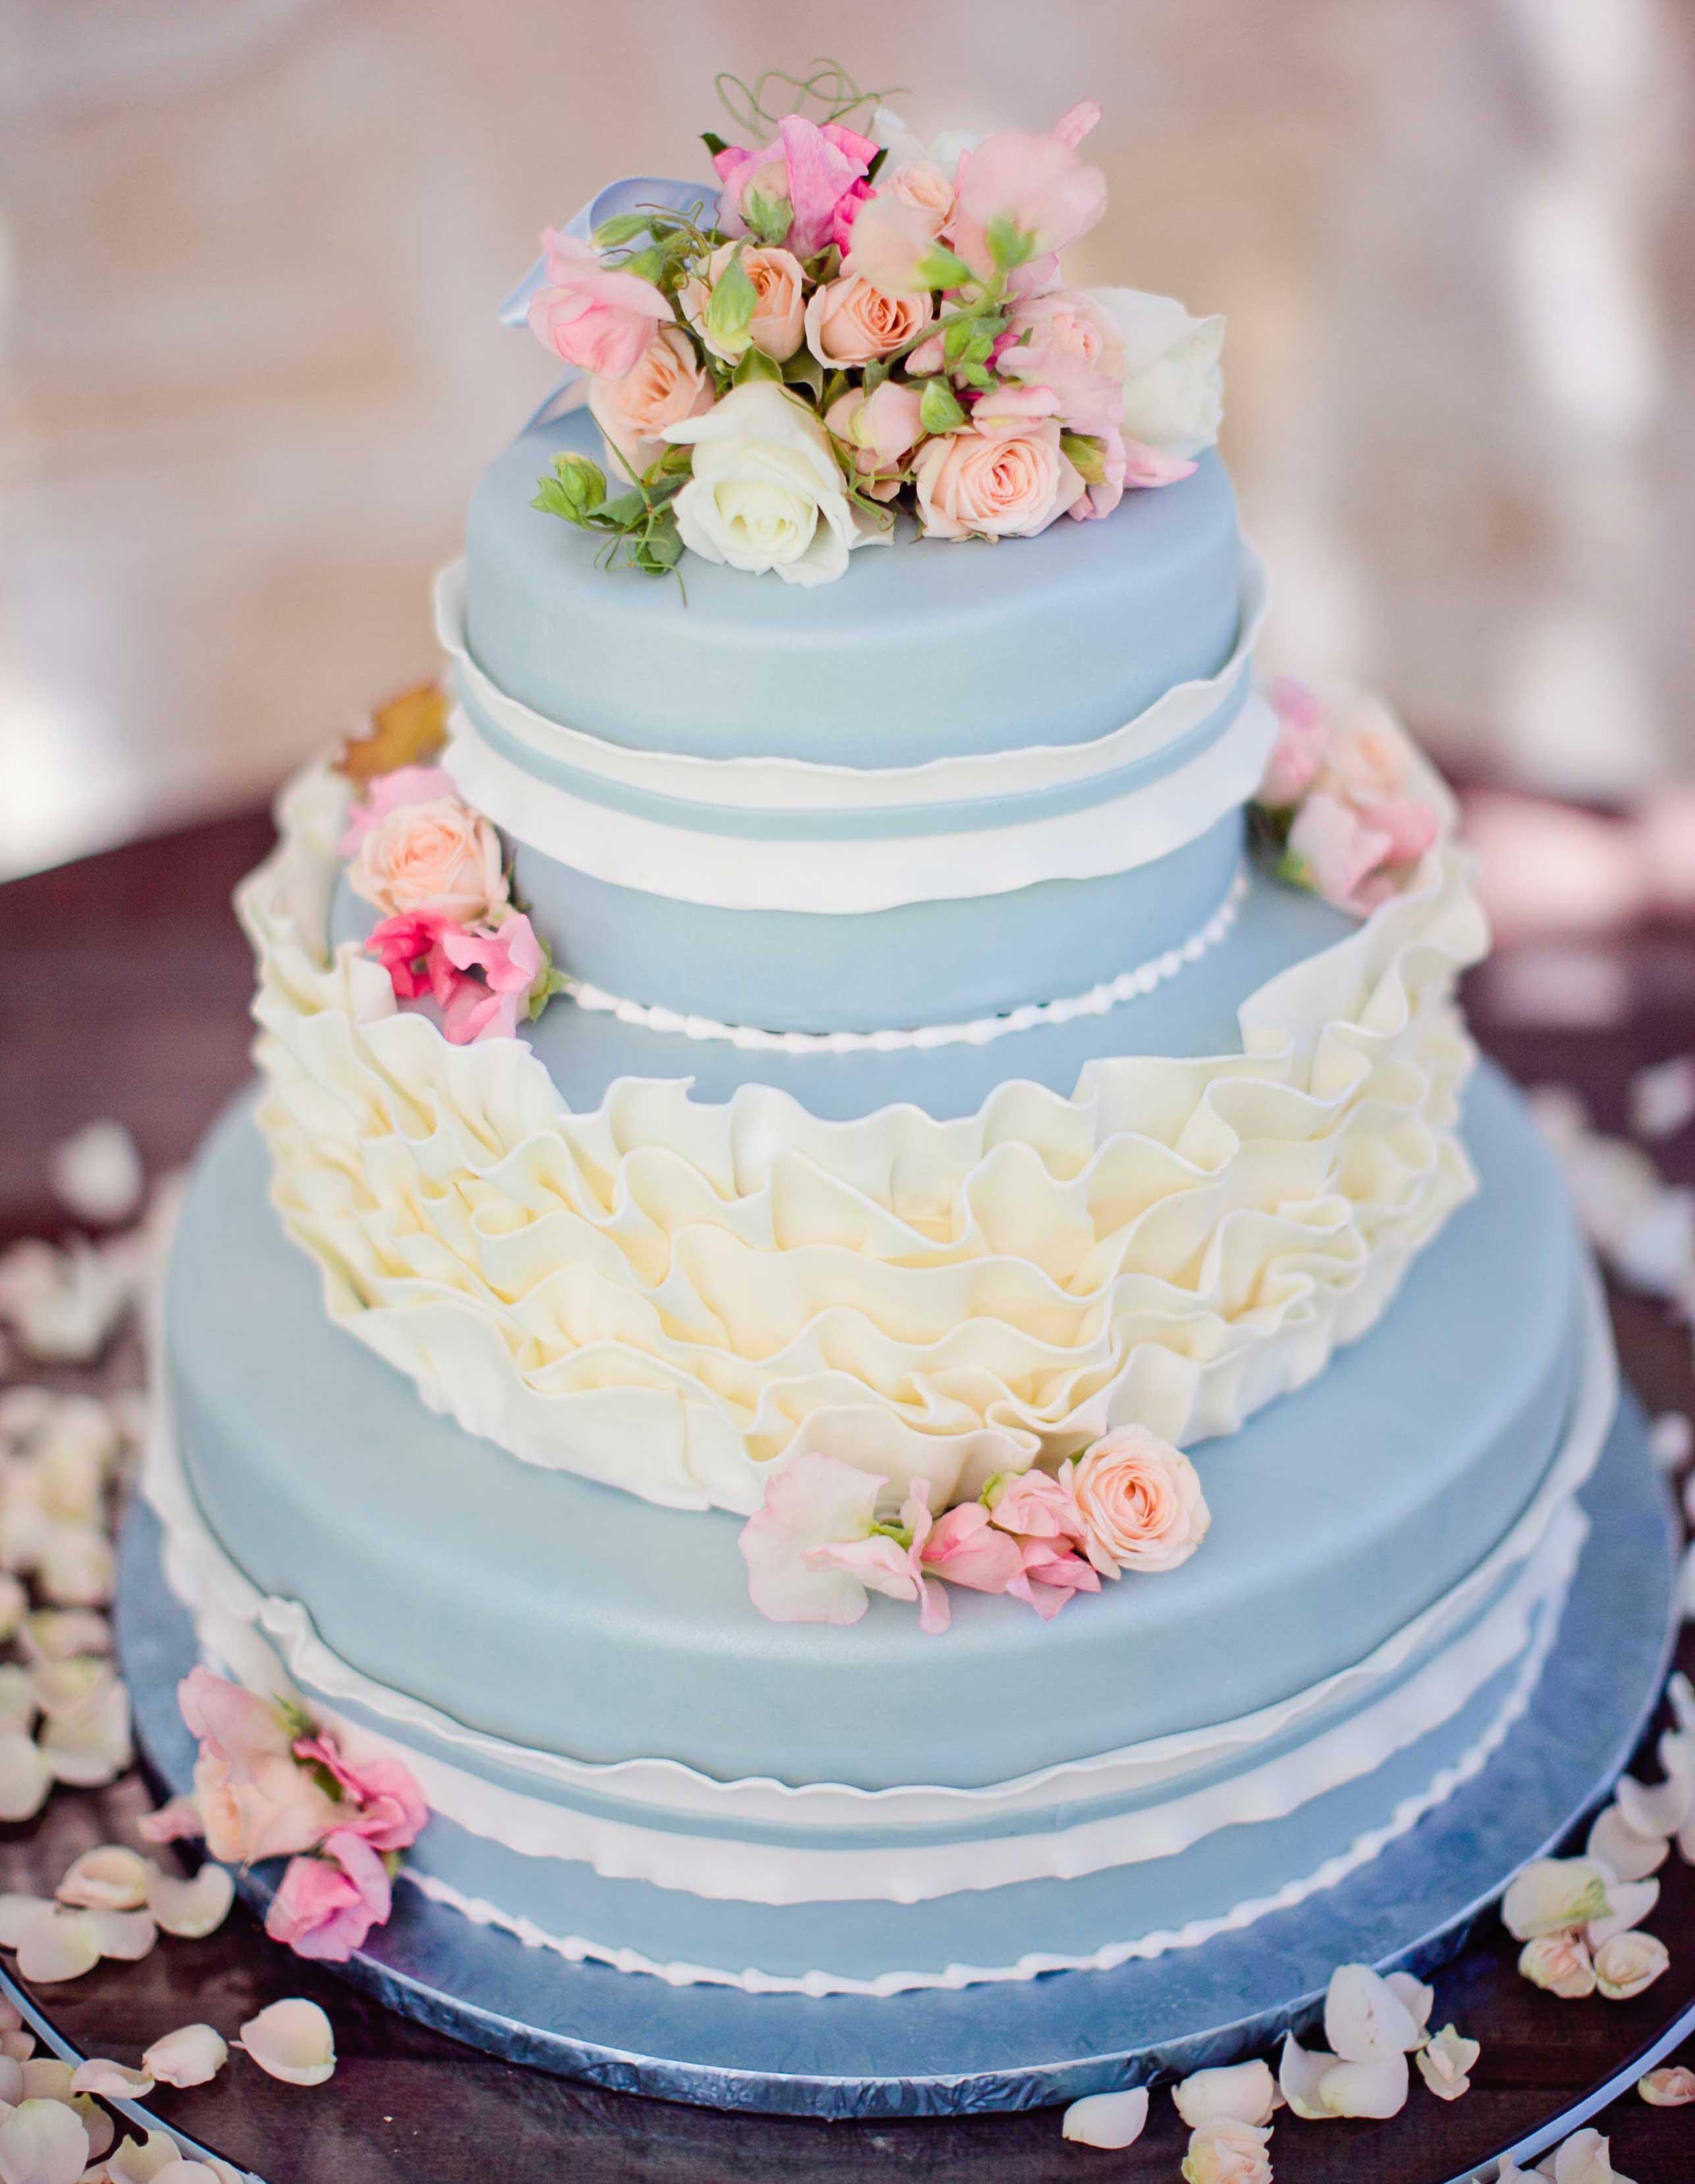 Wedding Cake clipart layer cake Cake Wedding Size Clipart Cake